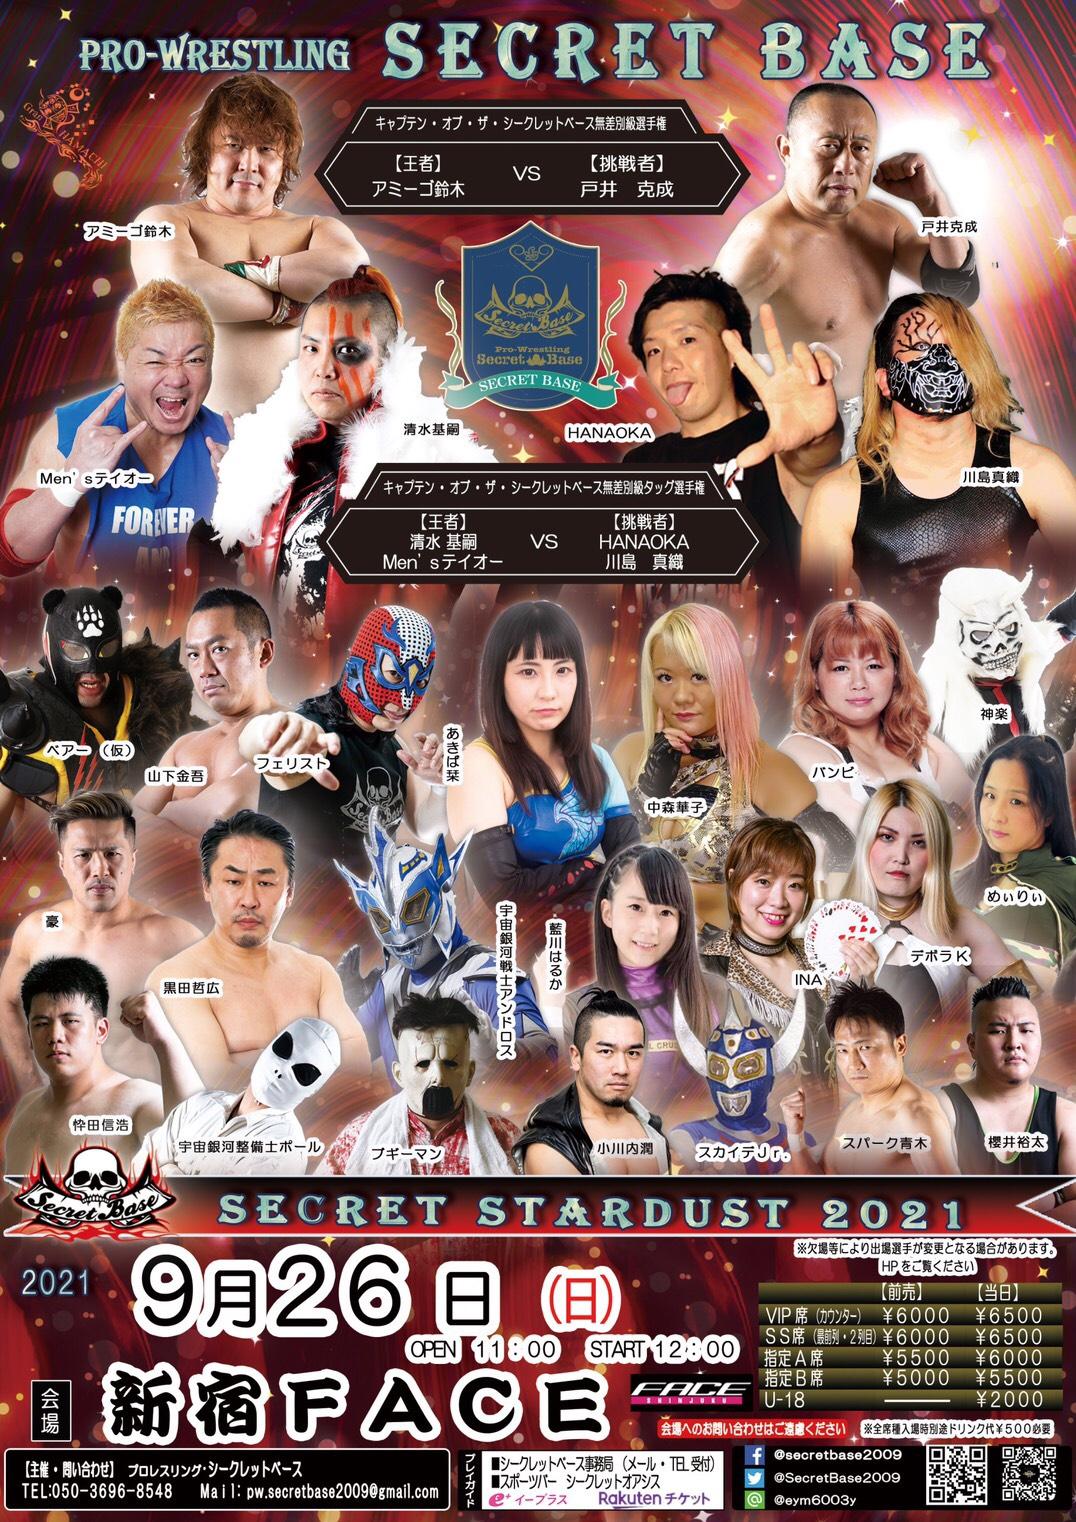 9月26日・新宿FACE大会全対戦カード決定!